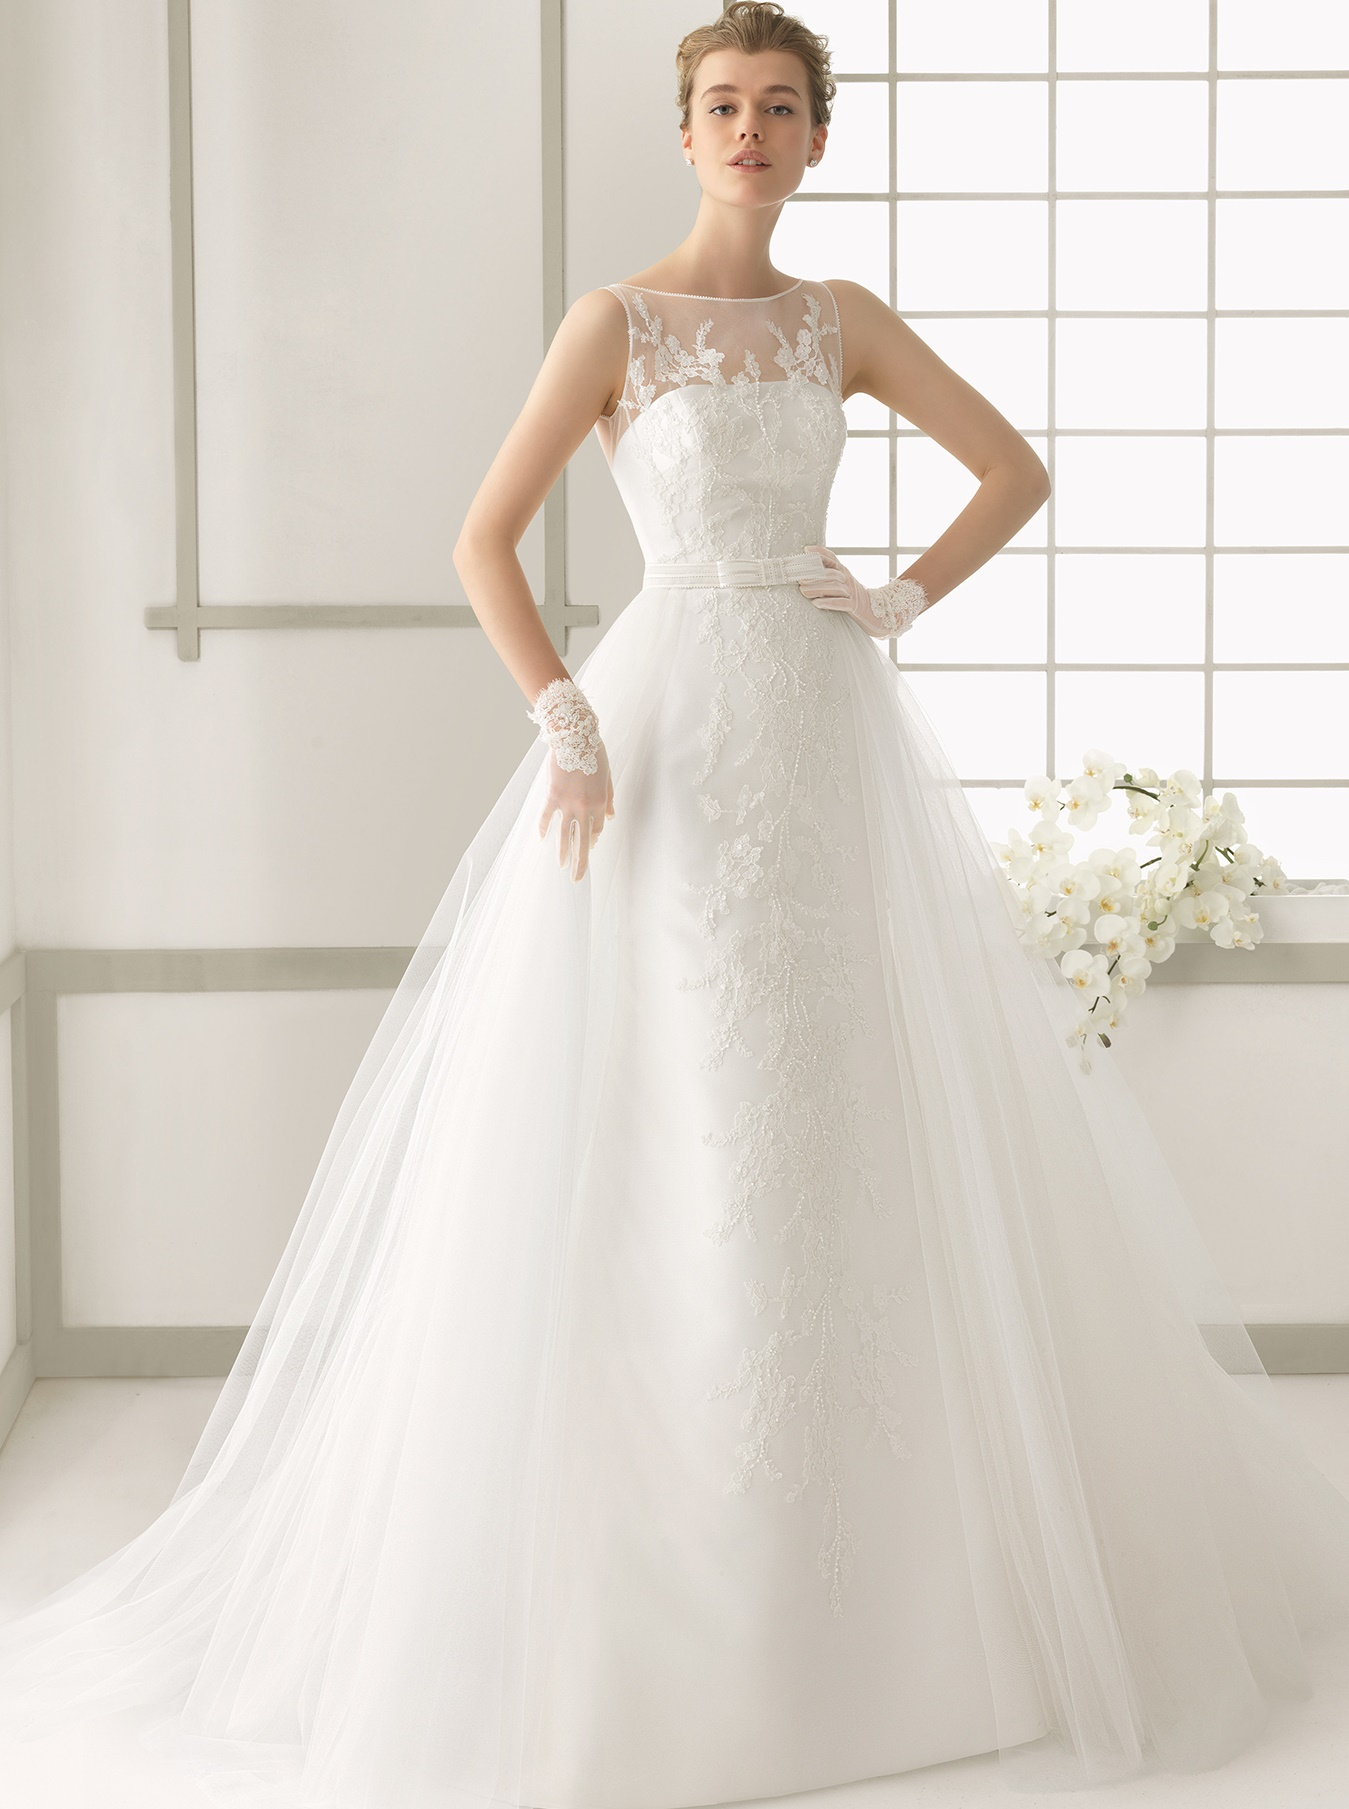 Rosa Clará4 - Vestidos de Noiva - Bridal Collection 2016